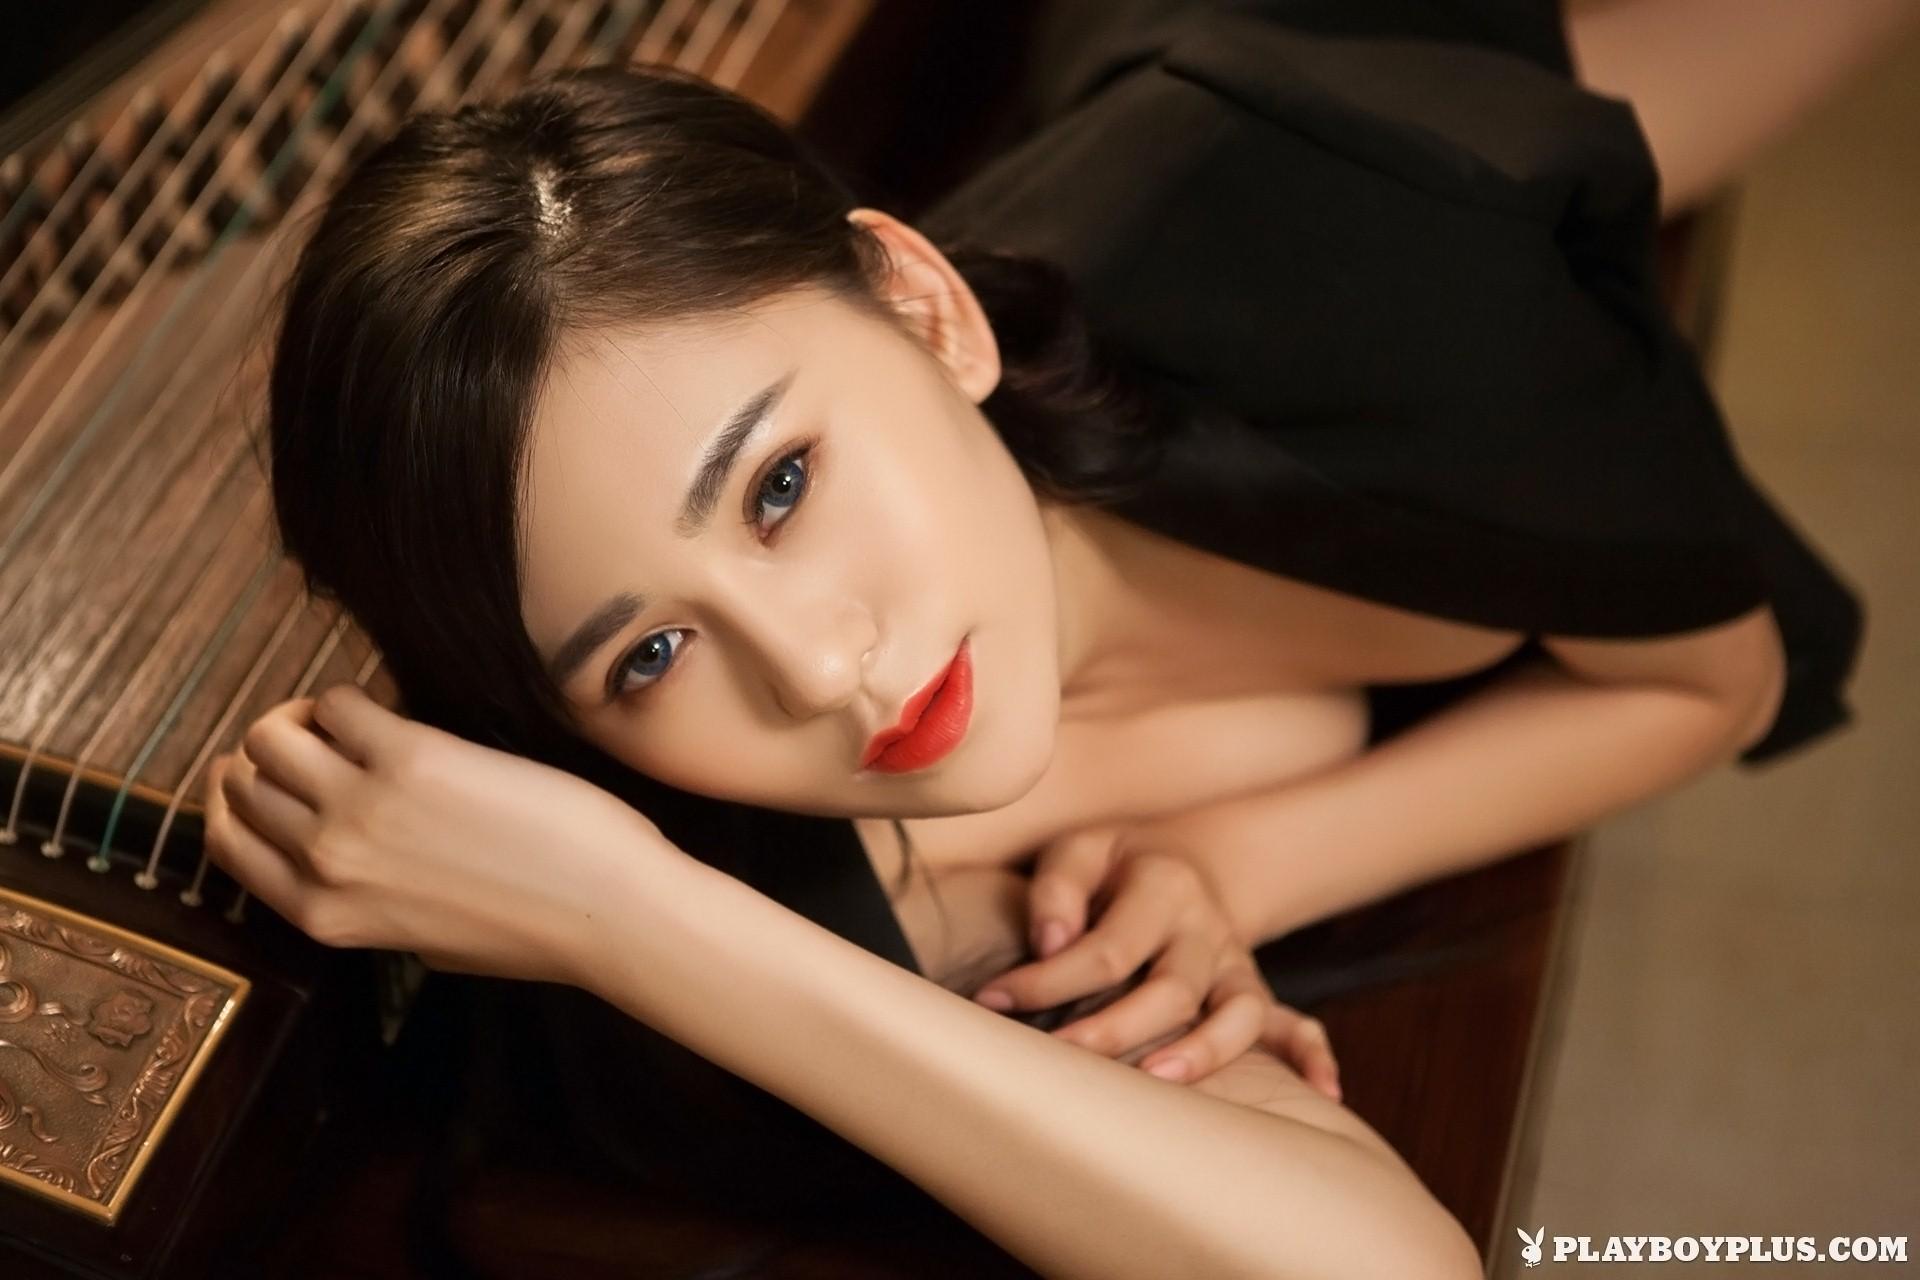 Wu Muxi nude in Hard Wood for Playboy   Daily Girls @ Female Update